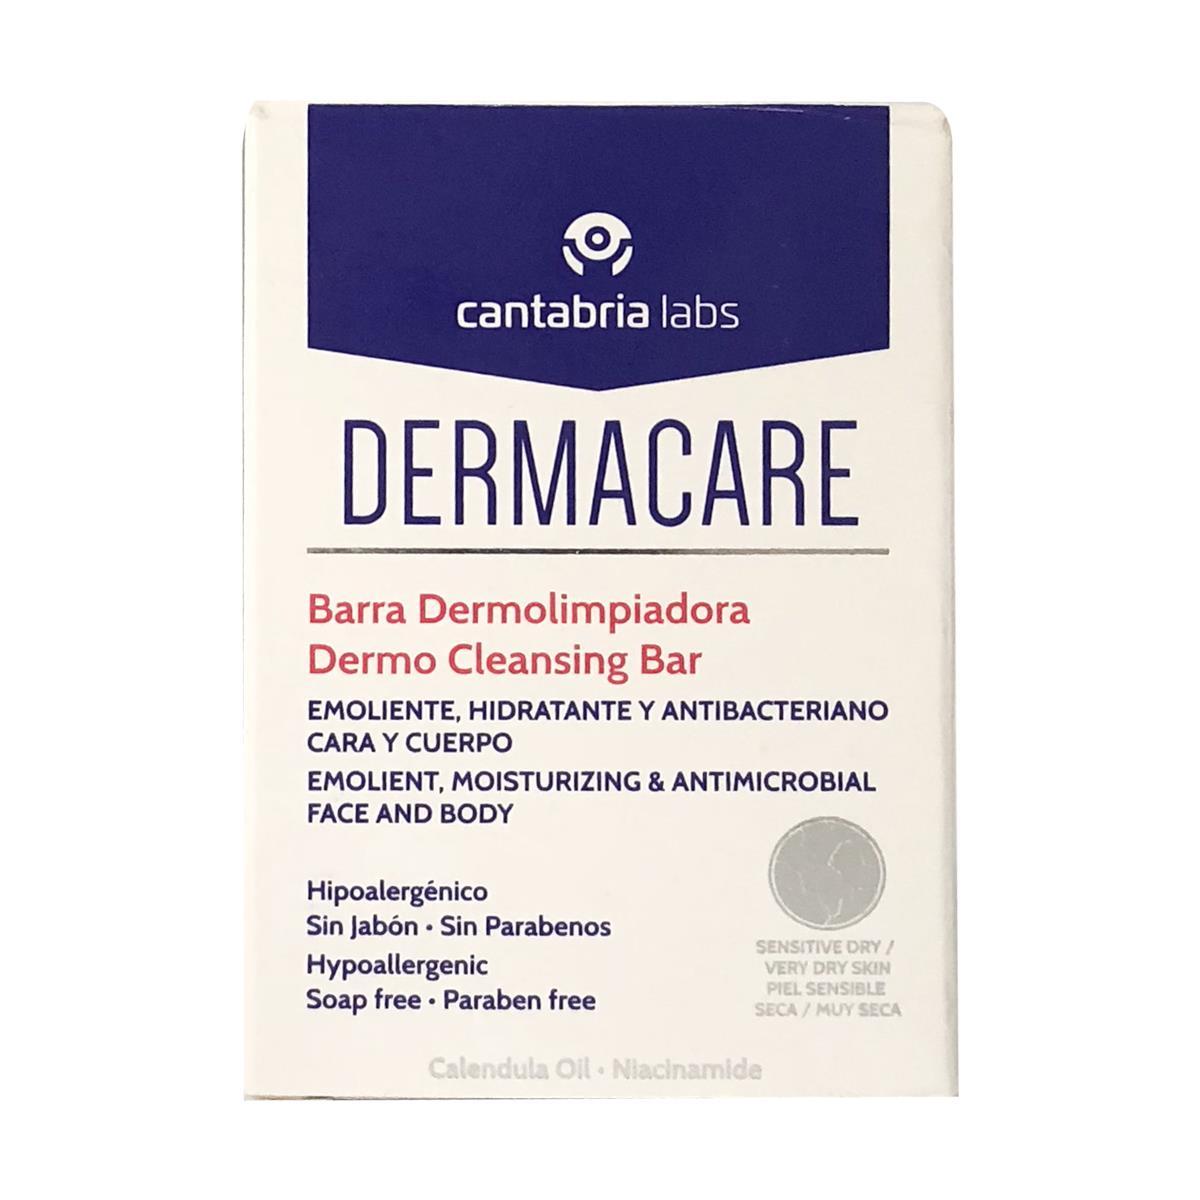 Dermacare Barra Dermolimpiadora 125 Gr